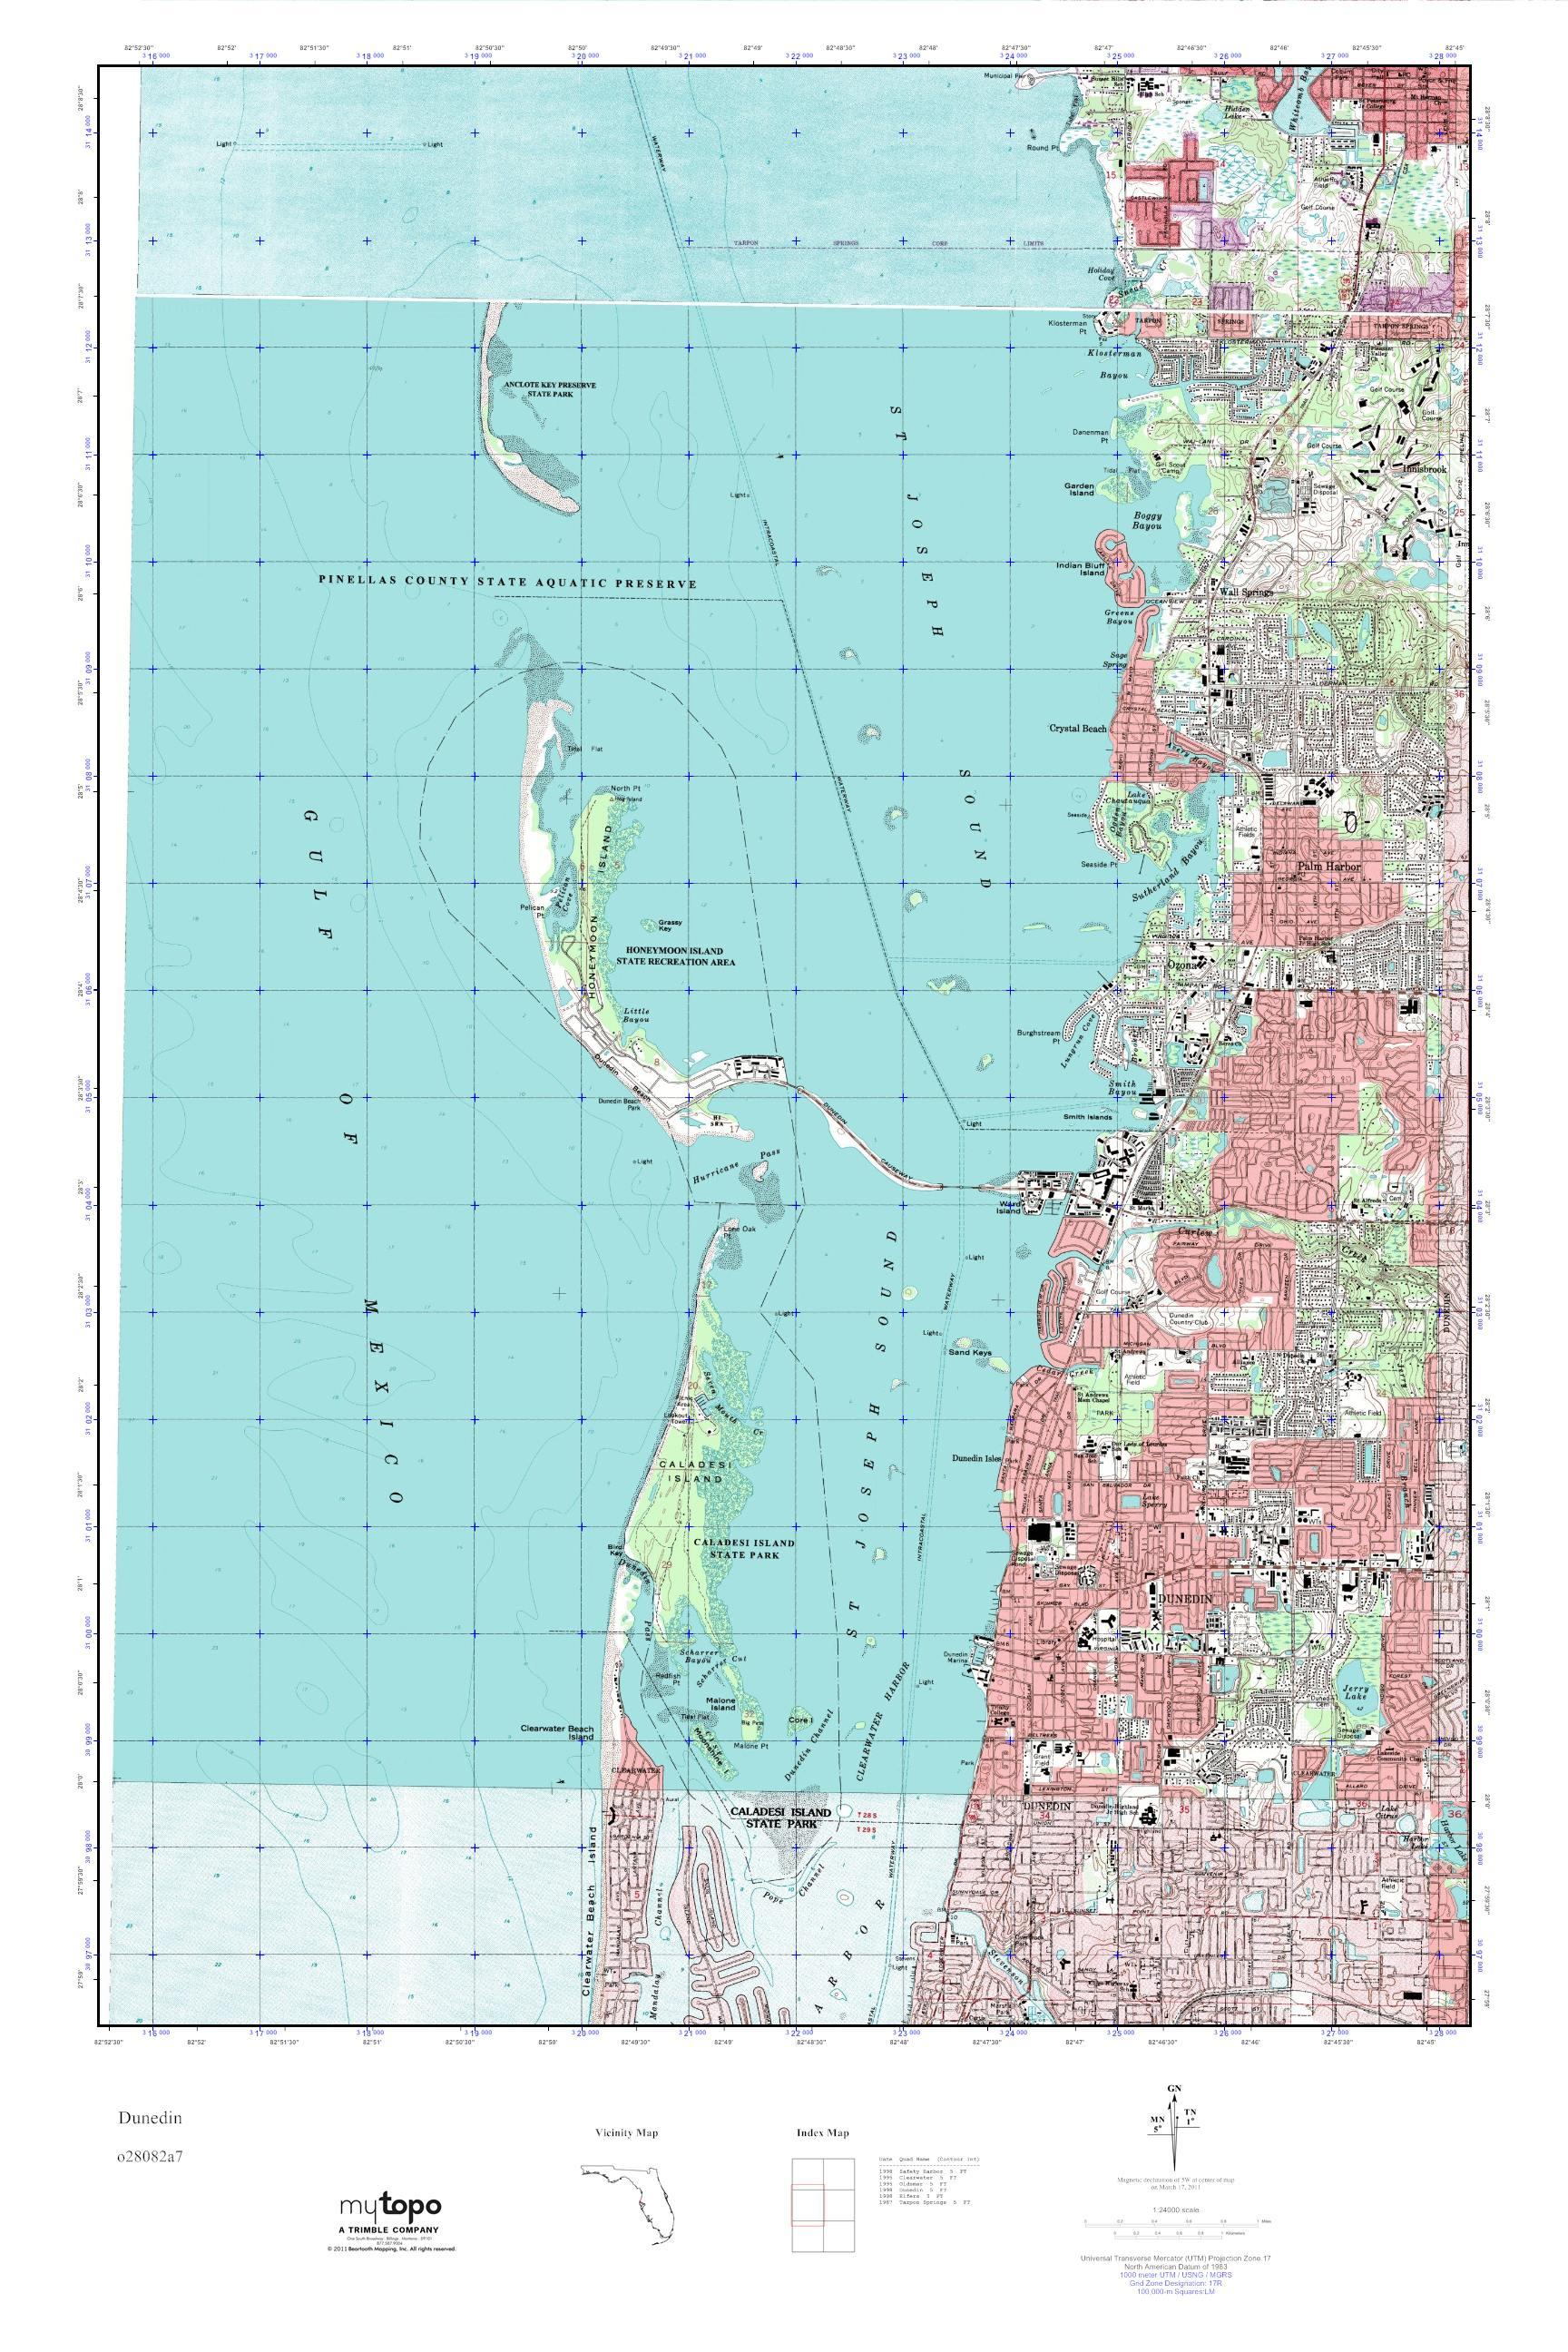 Mytopo Dunedin Florida Usgs Quad Topo Map